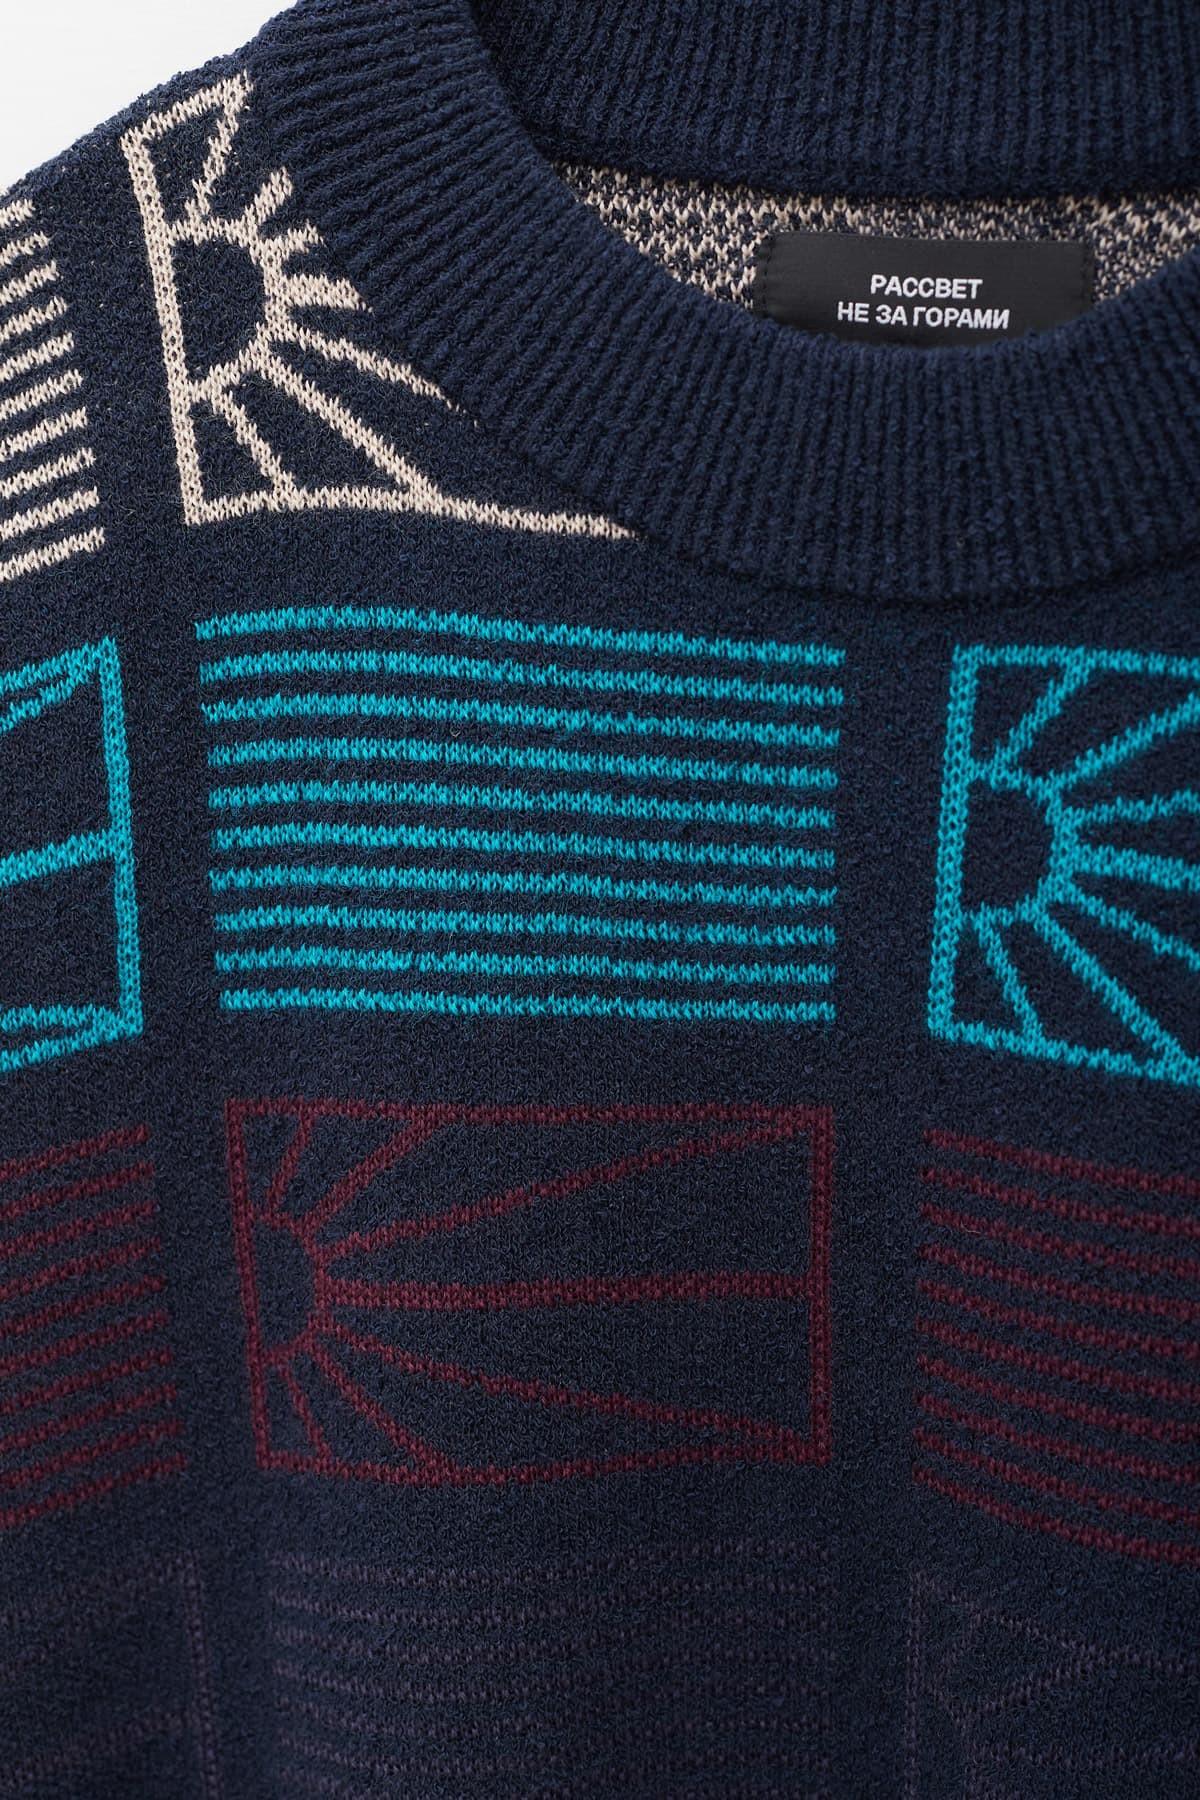 Comprar Comme Des Garcons Navy S28509 Knitwear